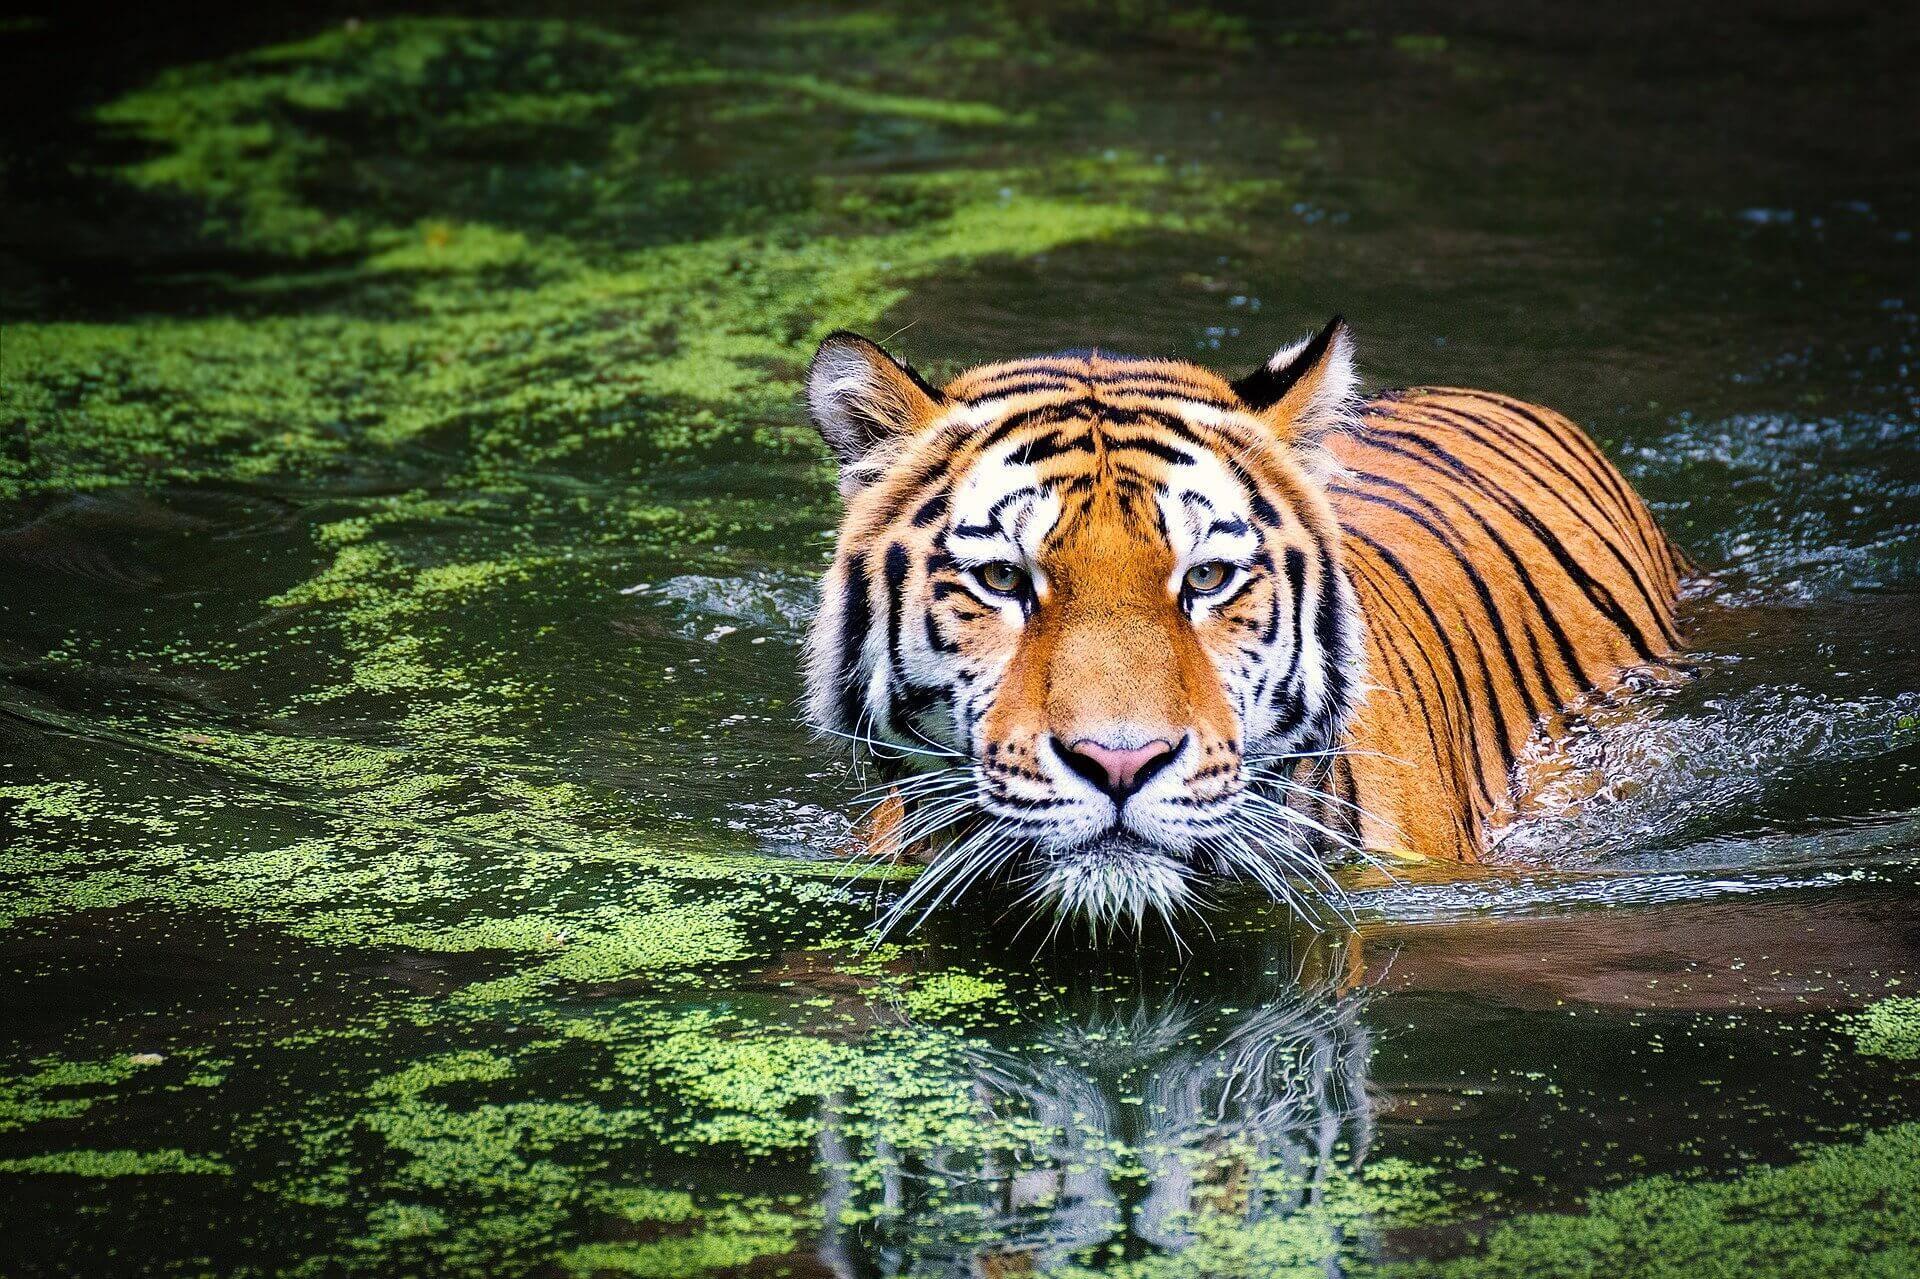 Tigre Selwo Aventura. Naturaleza en la costa del sol